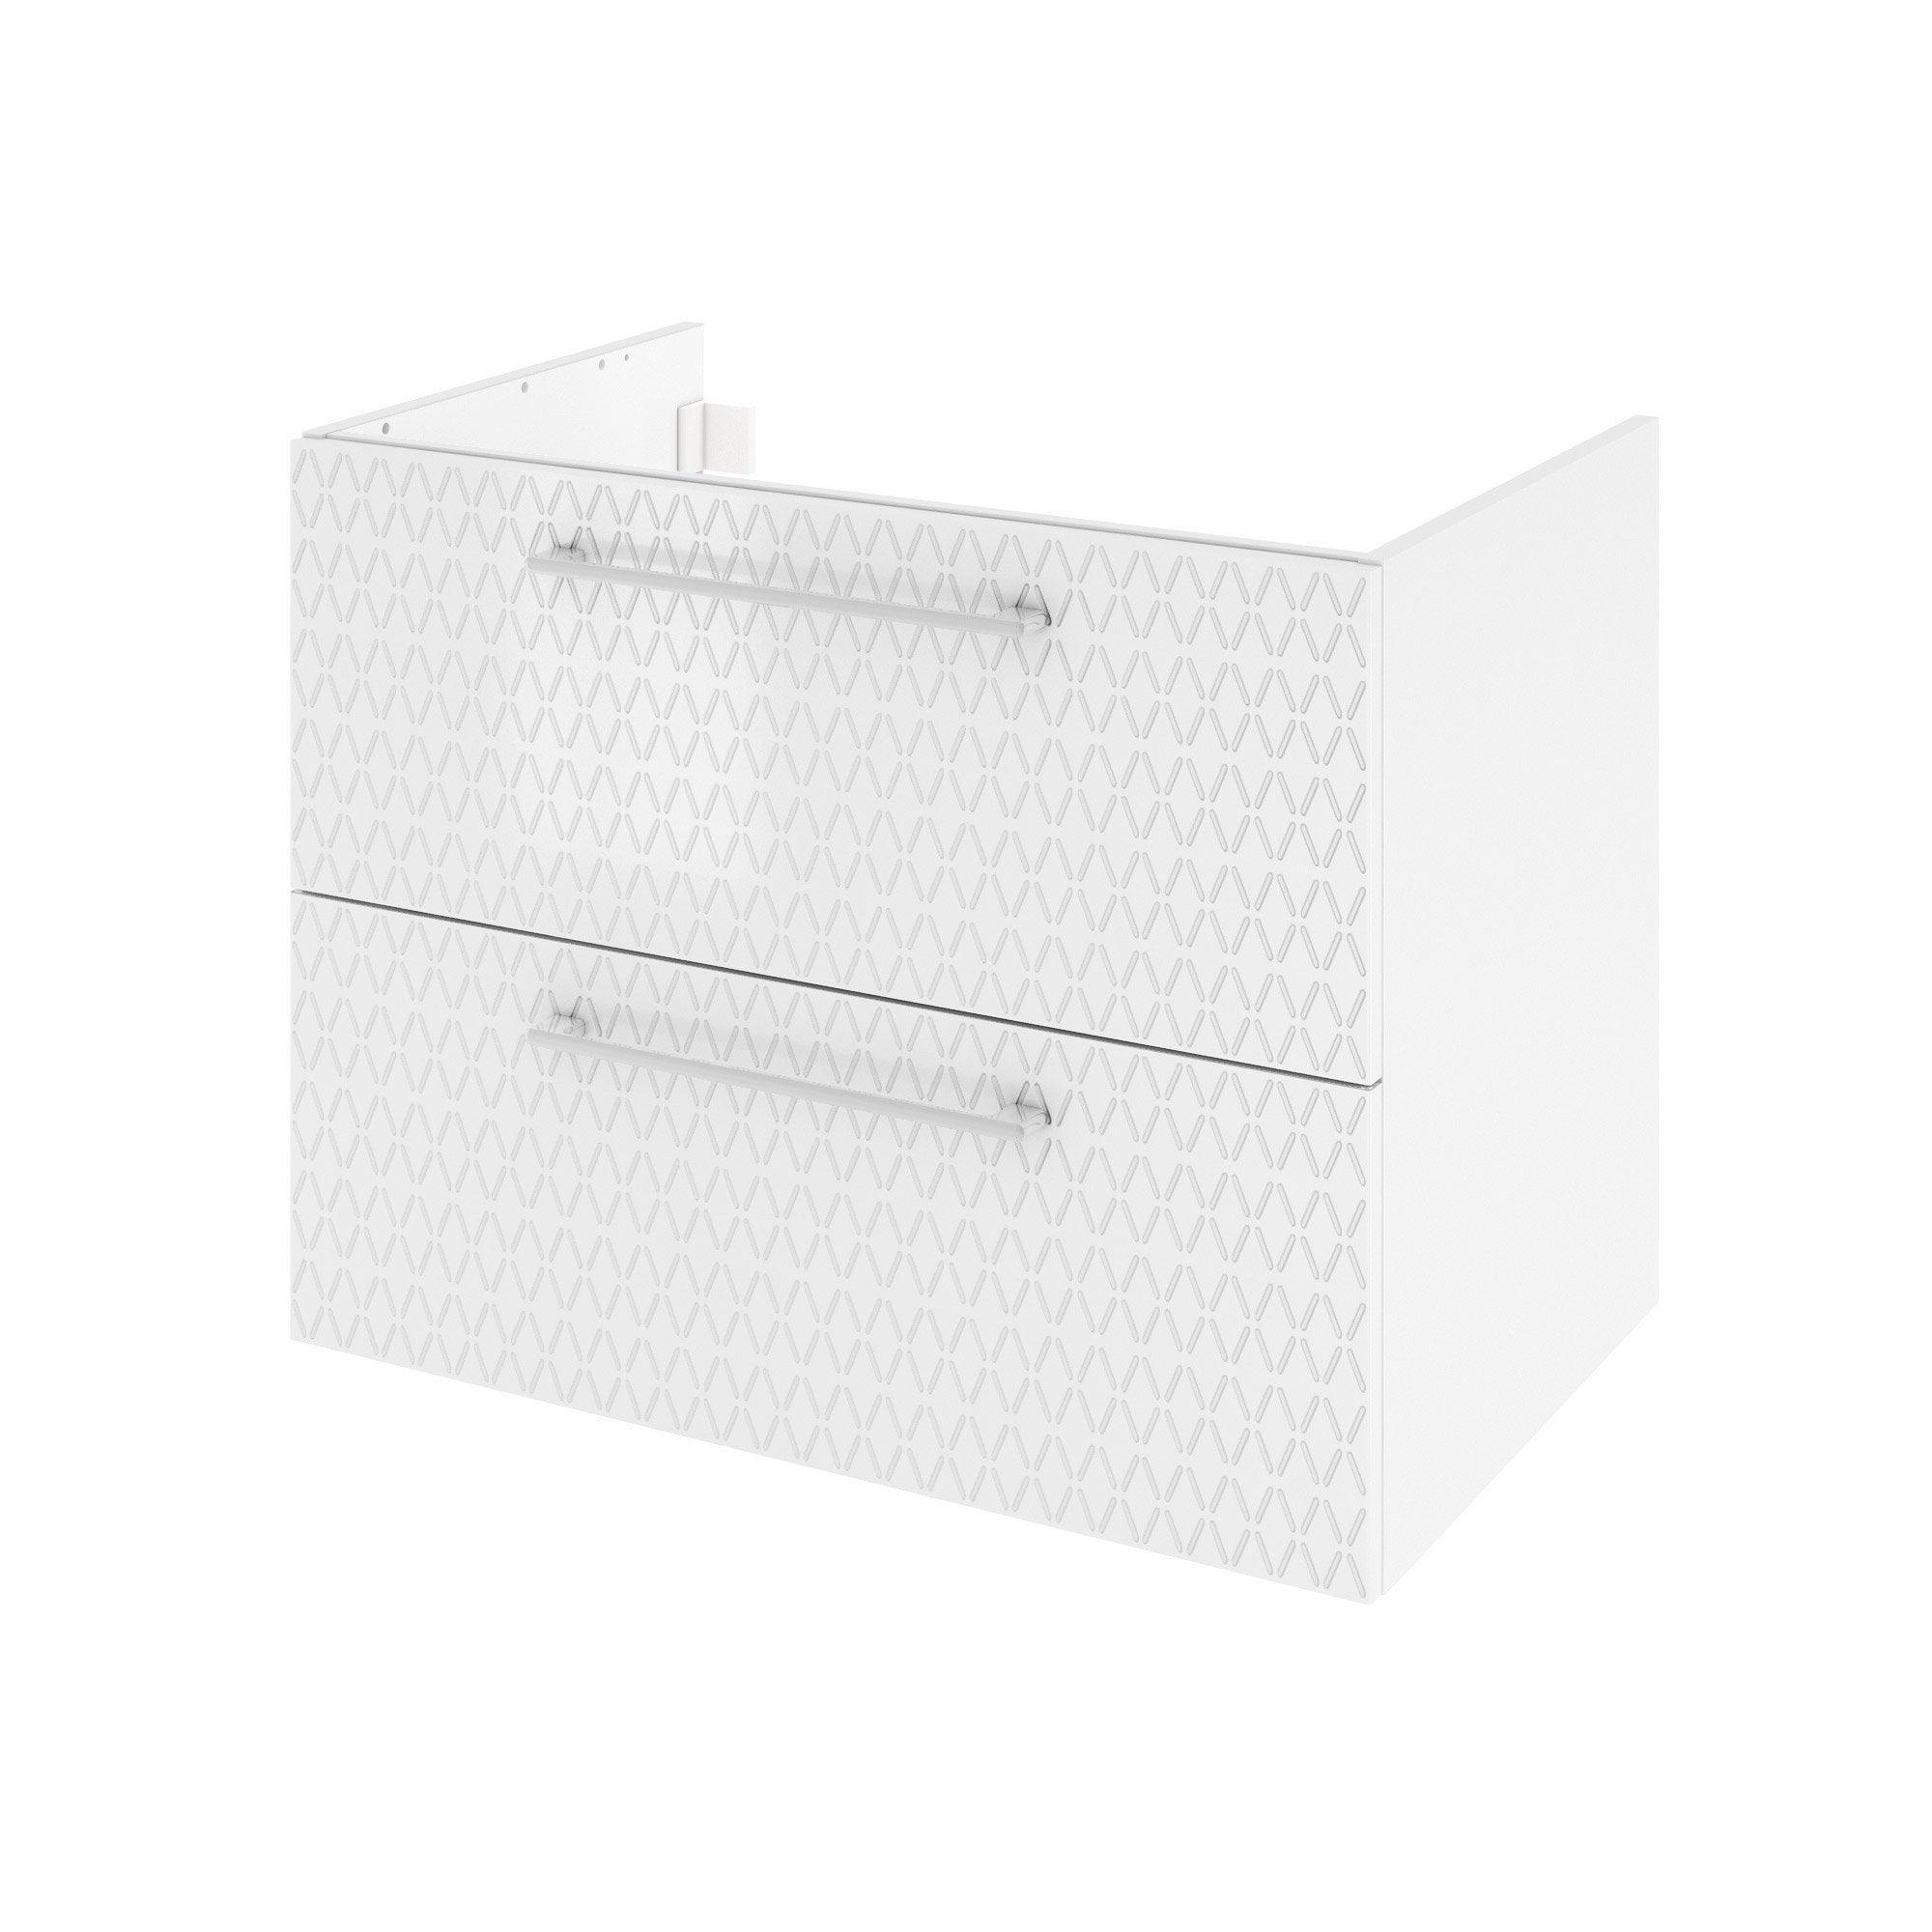 Meuble de salle de bains l.75 x H.58 x P.48 cm, blanc 3d, Remix